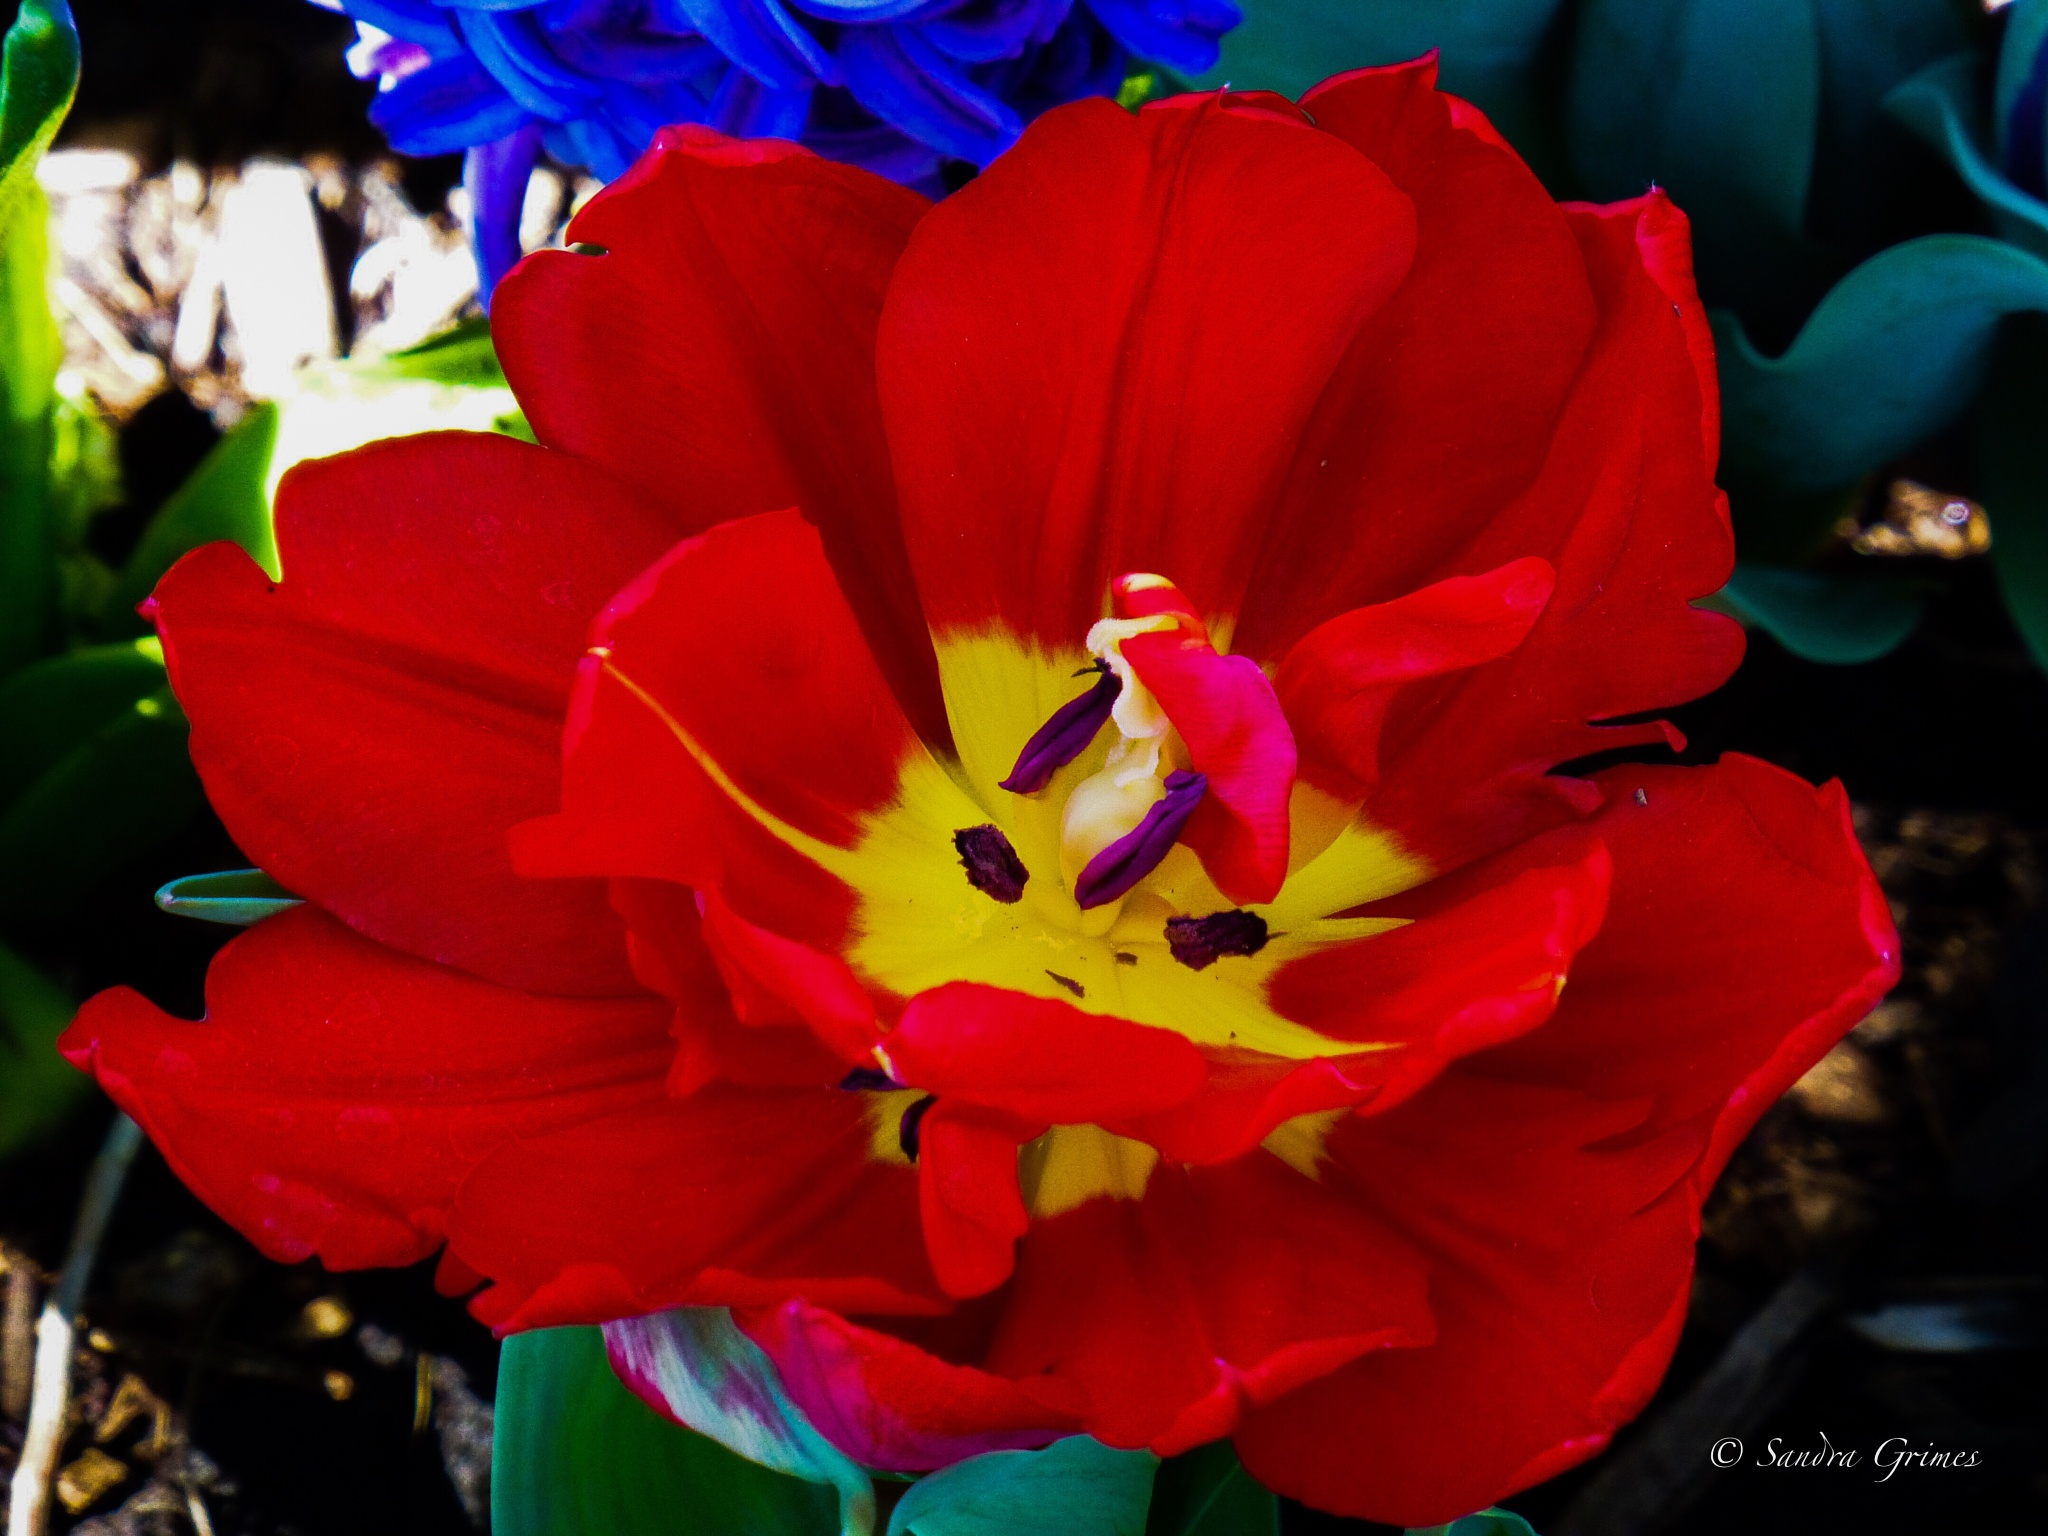 Abba Deep Red Tulip by TrixieGirl5192